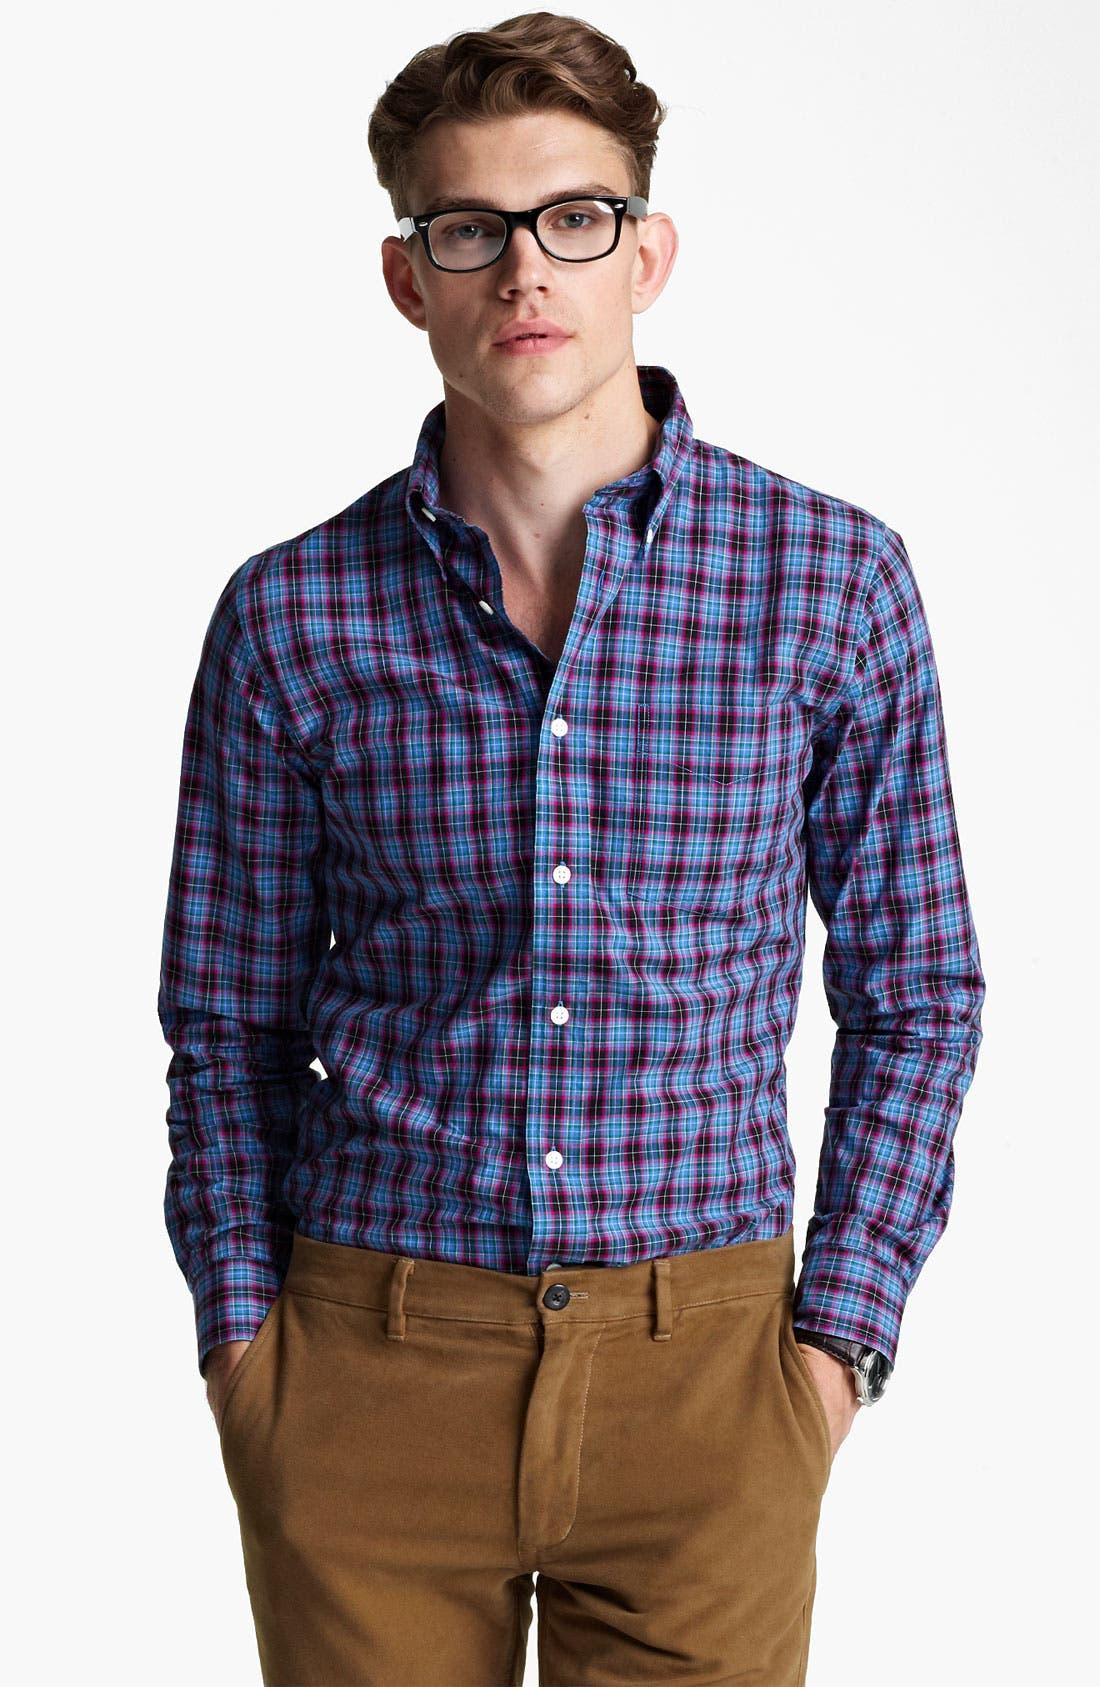 Alternate Image 1 Selected - Jack Spade 'Arnet' Check Woven Shirt